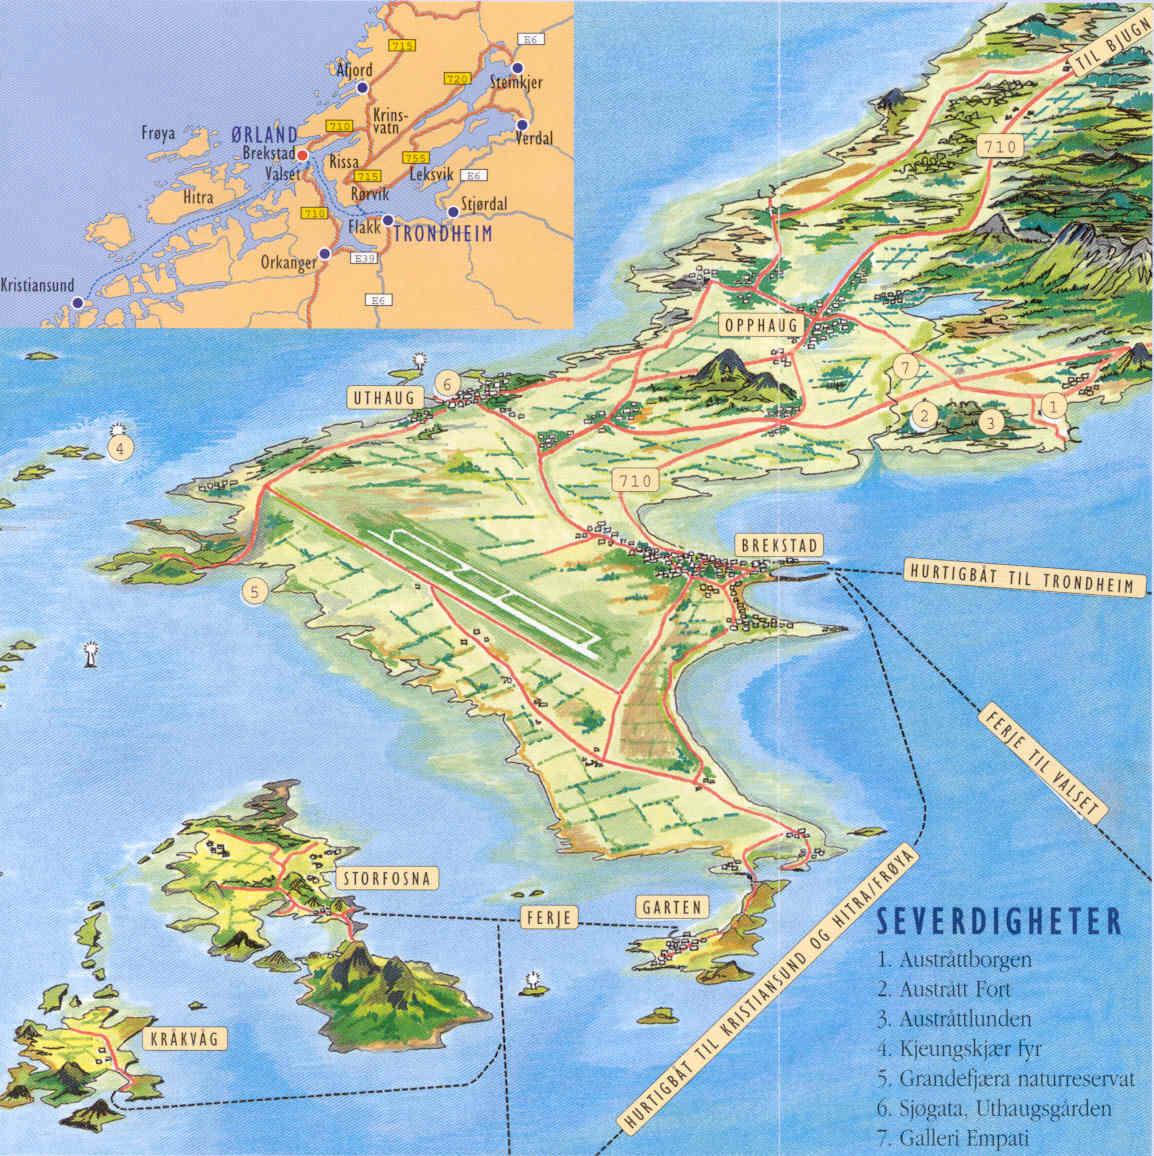 kart over ørlandet File:Orlandskart.   Wikimedia Commons kart over ørlandet